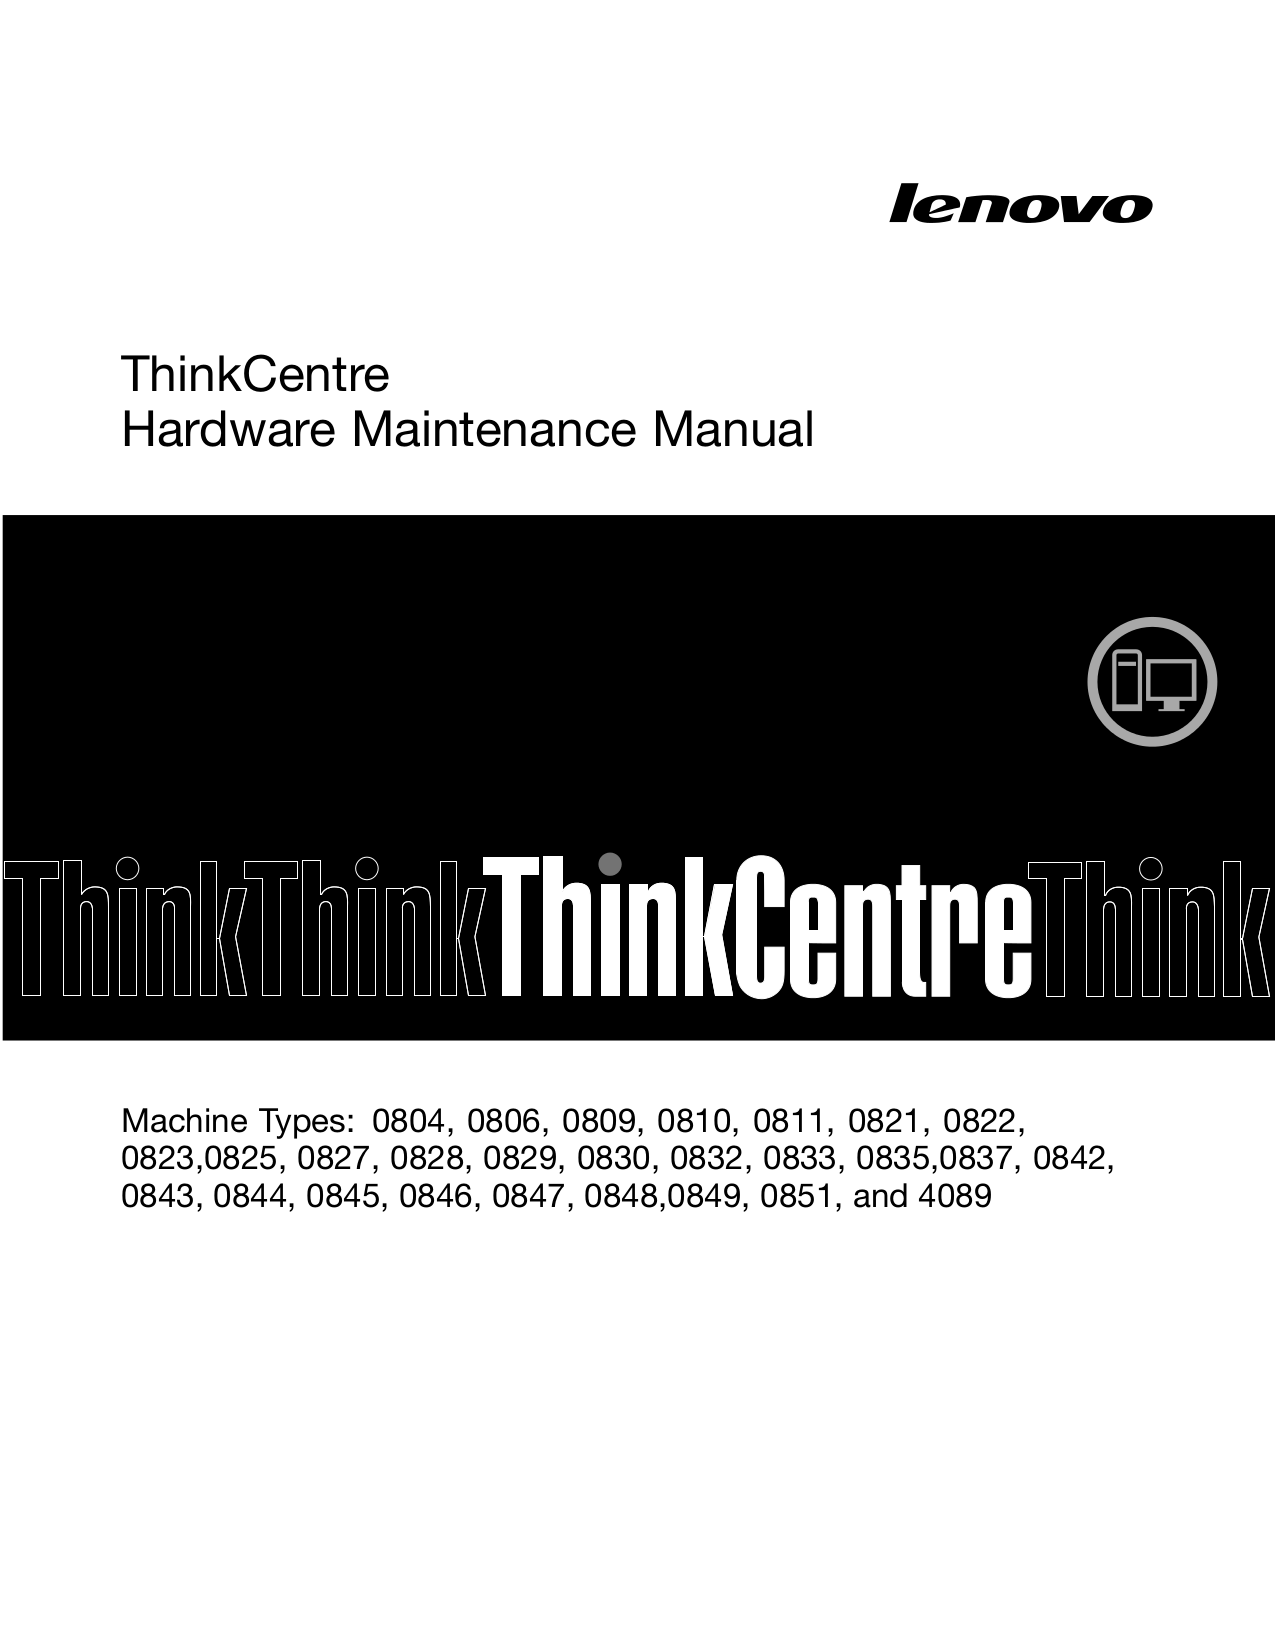 pdf for Lenovo Desktop ThinkCentre M70e 0842 manual